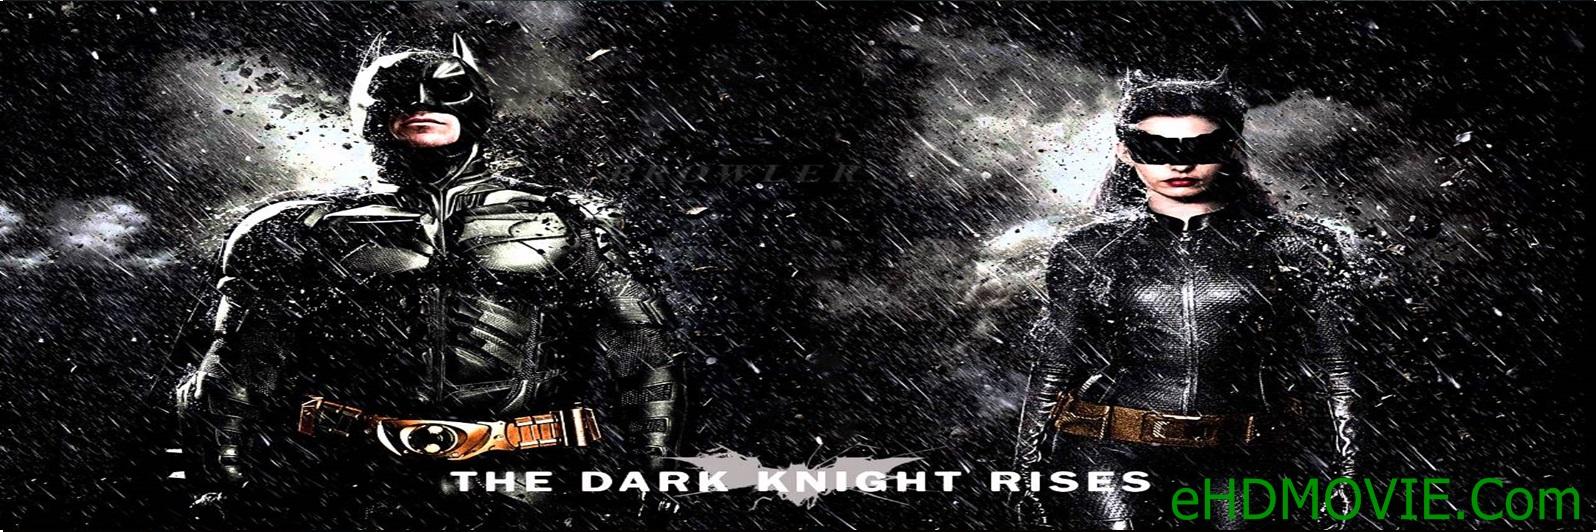 The Dark Knight Rises 2012 Full Movie Dual Audio [Hindi – English] 1080p - 720p - 480p ORG BRRip 400MB - 1.5GB - 3GB ESubs Free Download